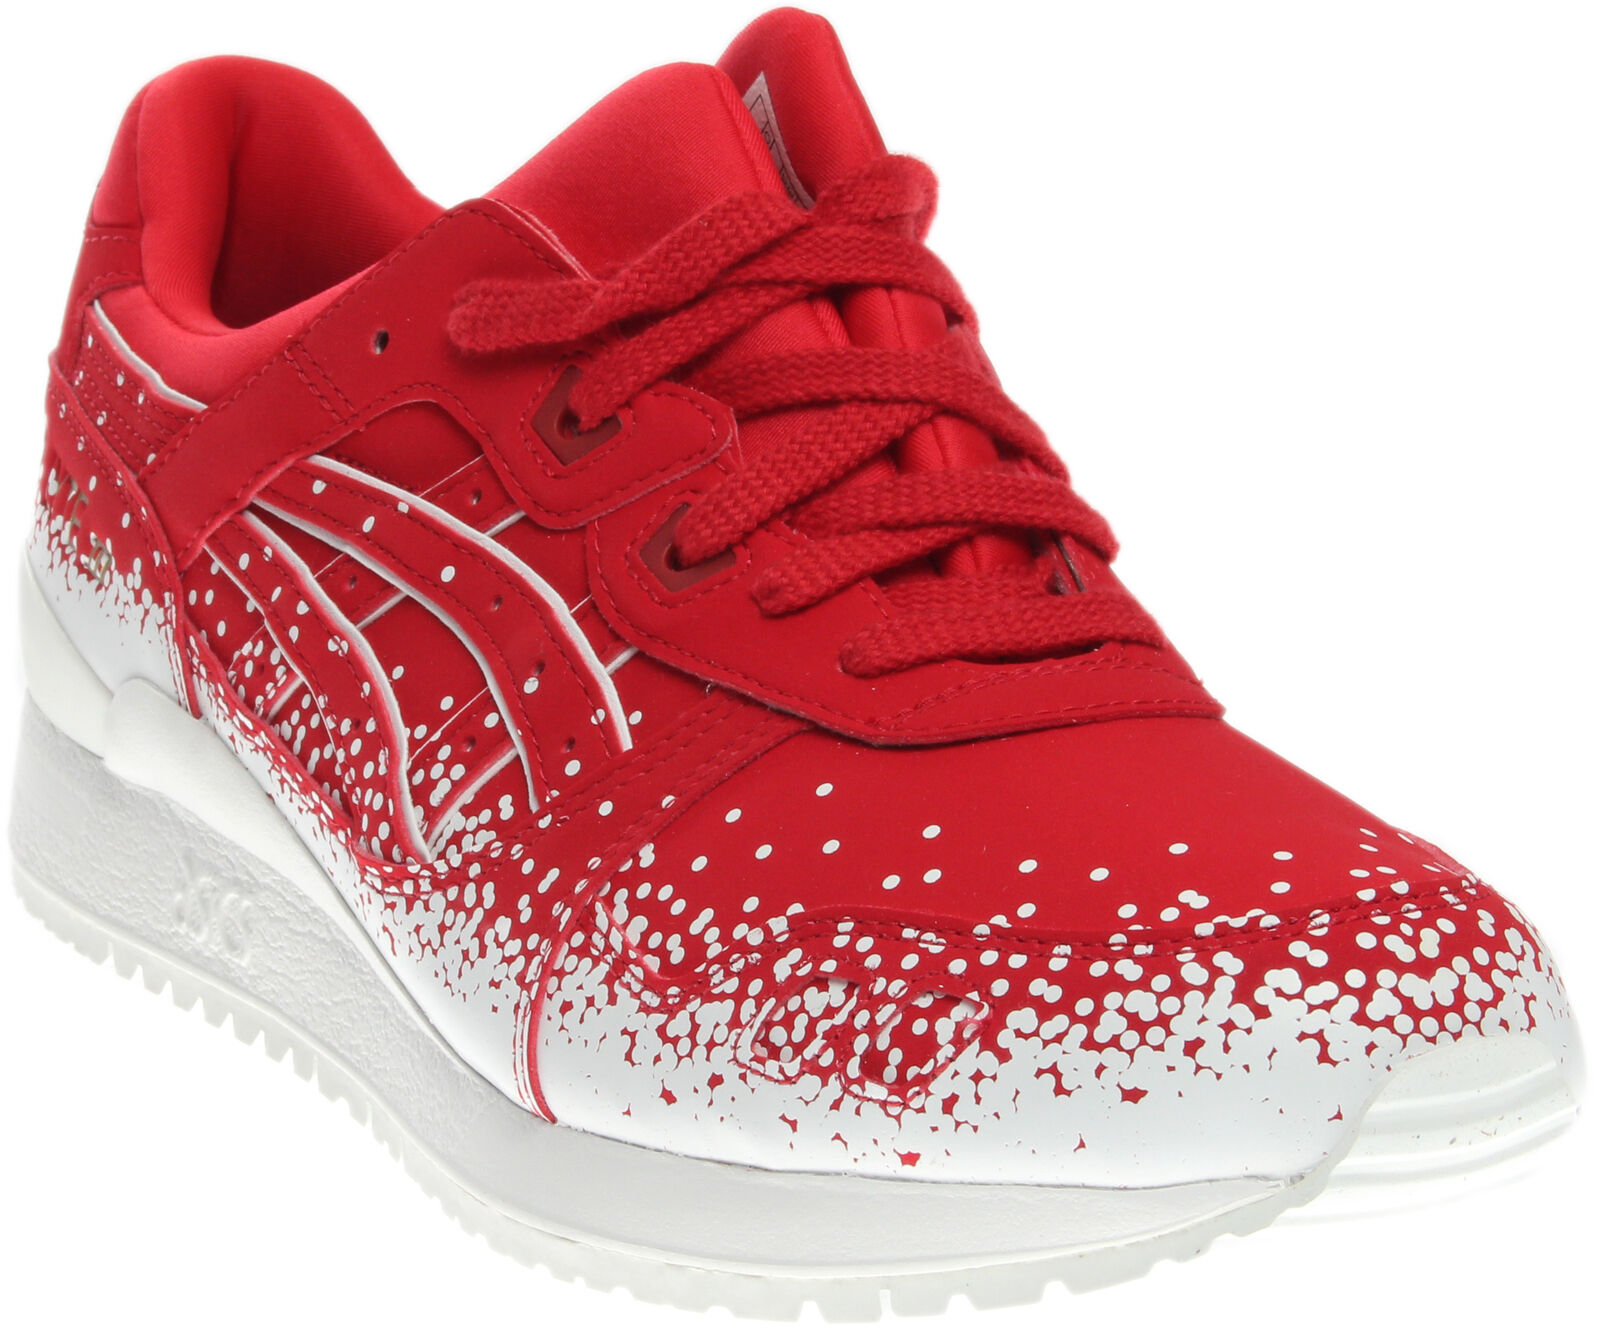 Nike Lebron XIII 13 Christmas 16 Basketball Shoes 807219-108 16 Christmas Size 12 49a74c